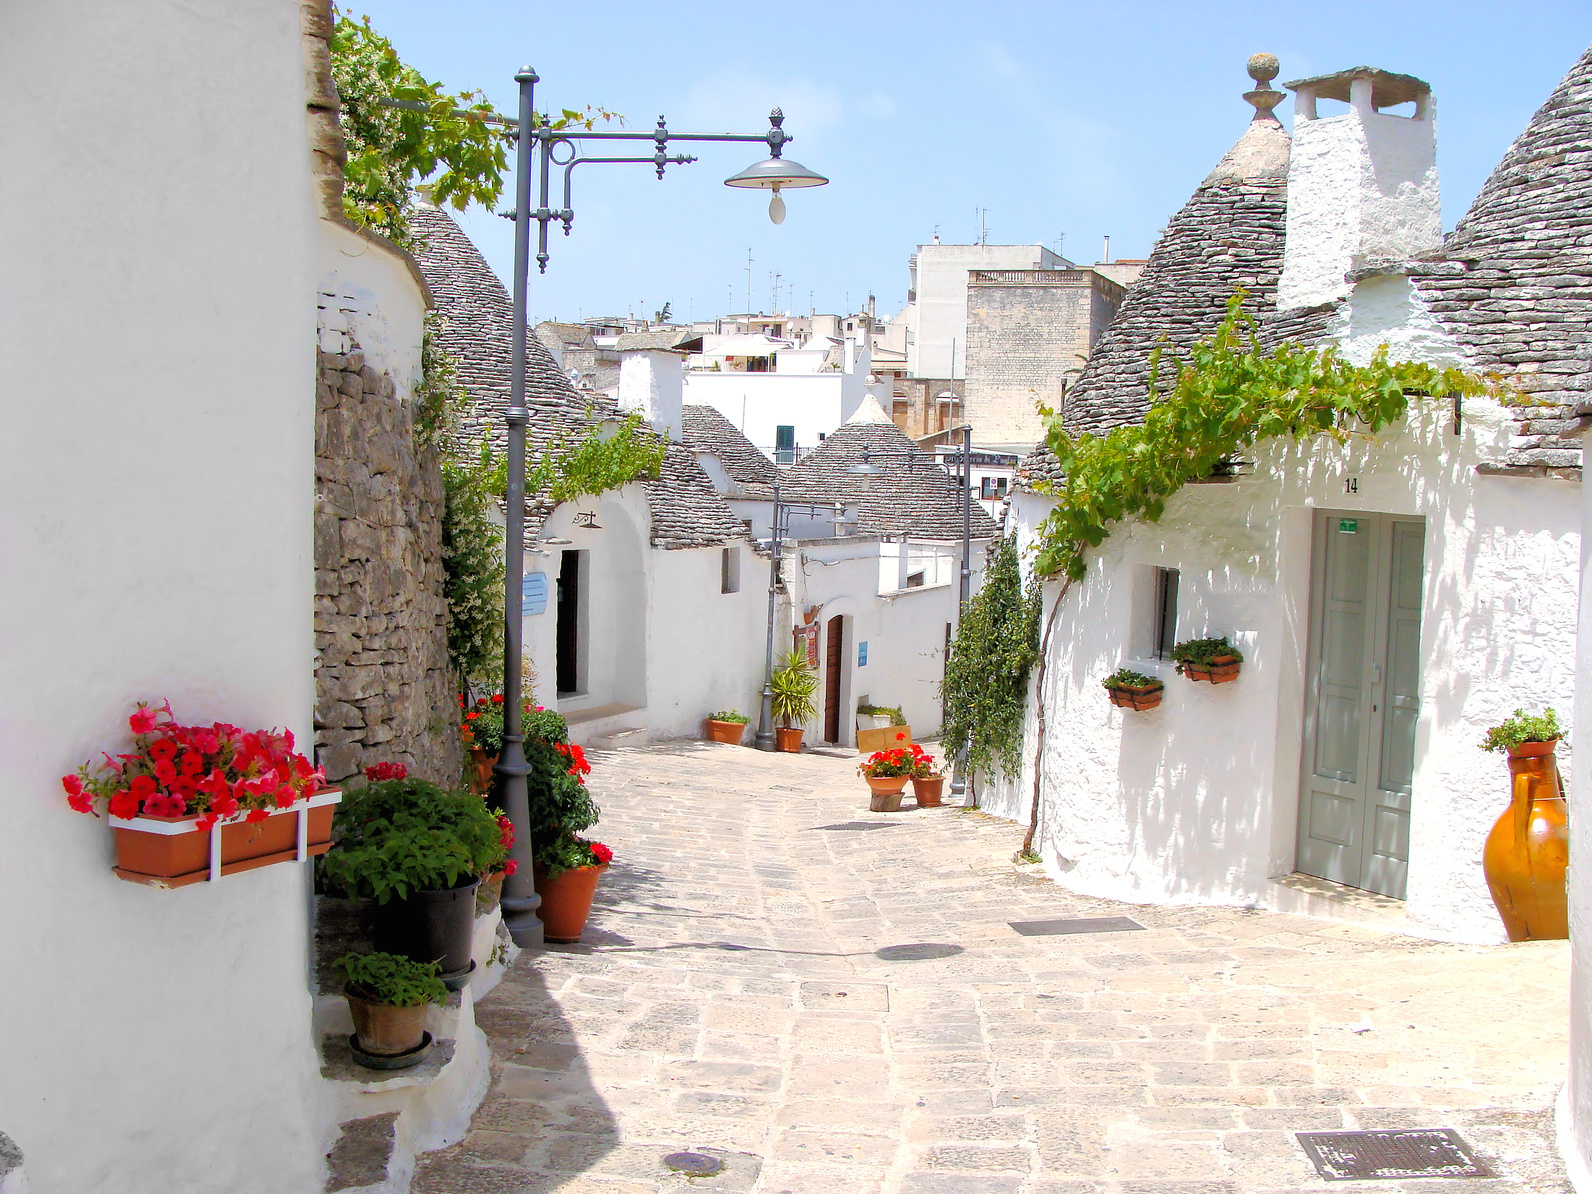 Pretty street among the trulli of Alberobello, Italy